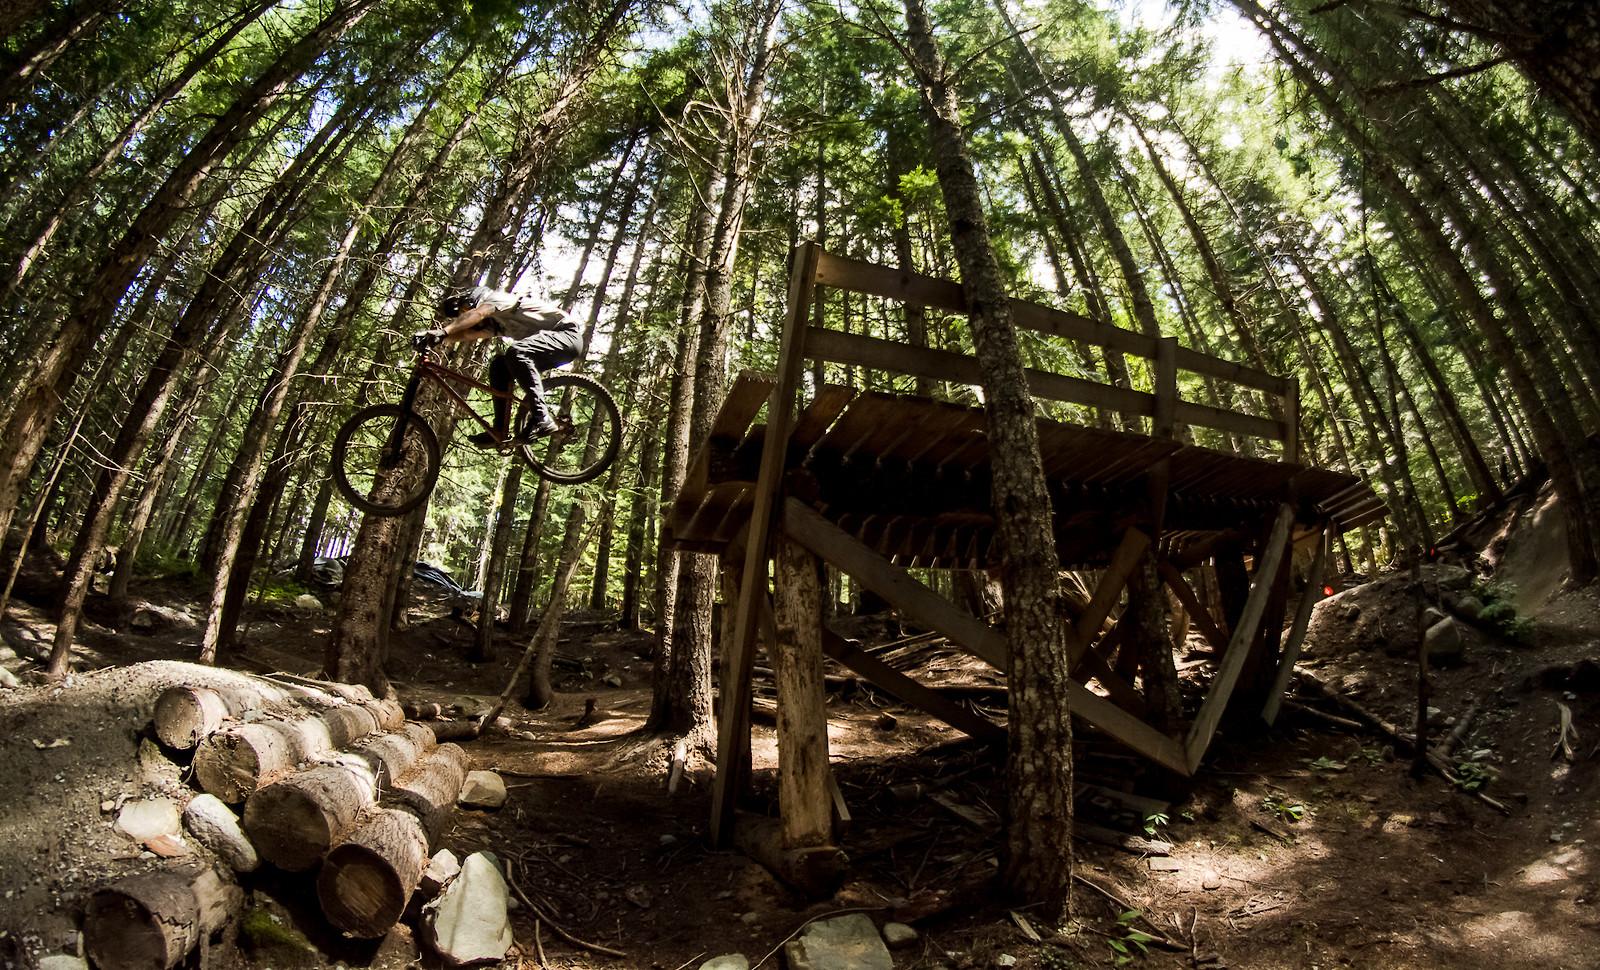 Whistler Mountain Bike Park on hardtail - Banan - Mountain Biking Pictures - Vital MTB